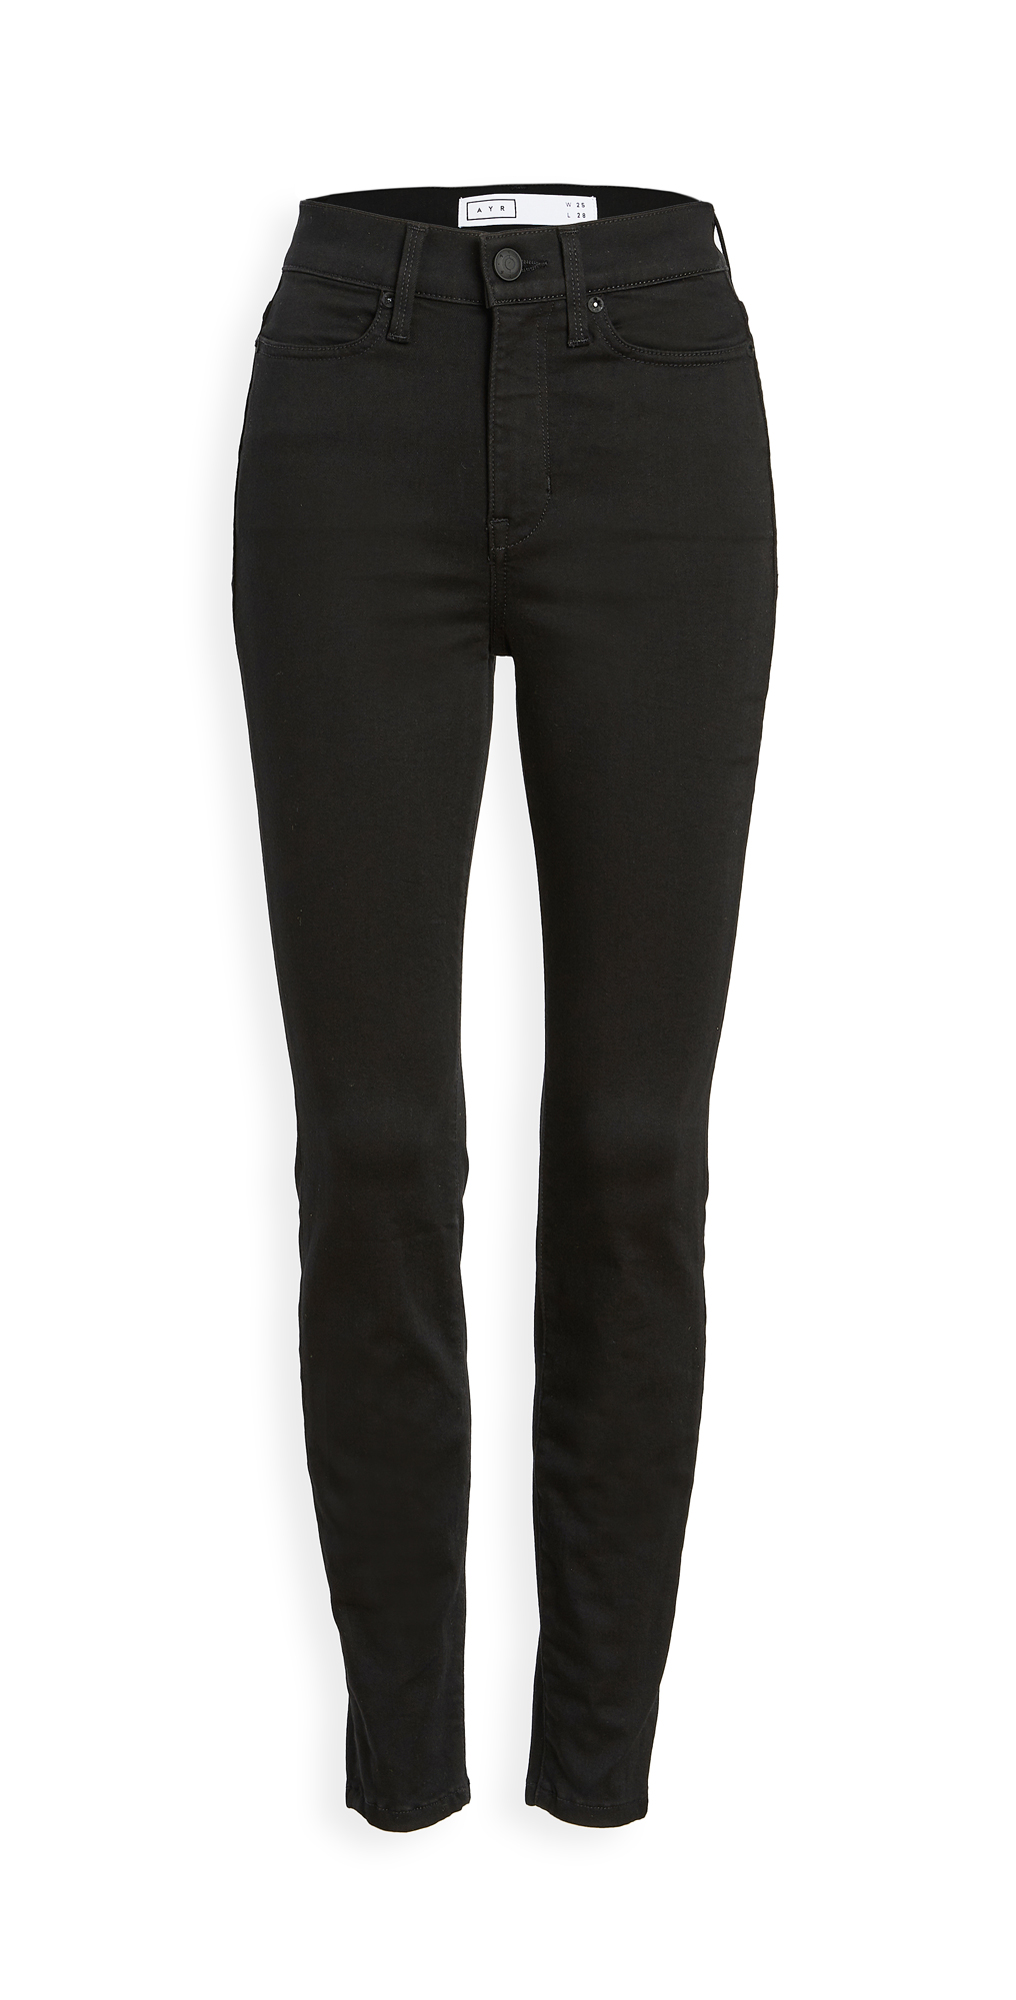 AYR Hi-Rise Skinny Jeans